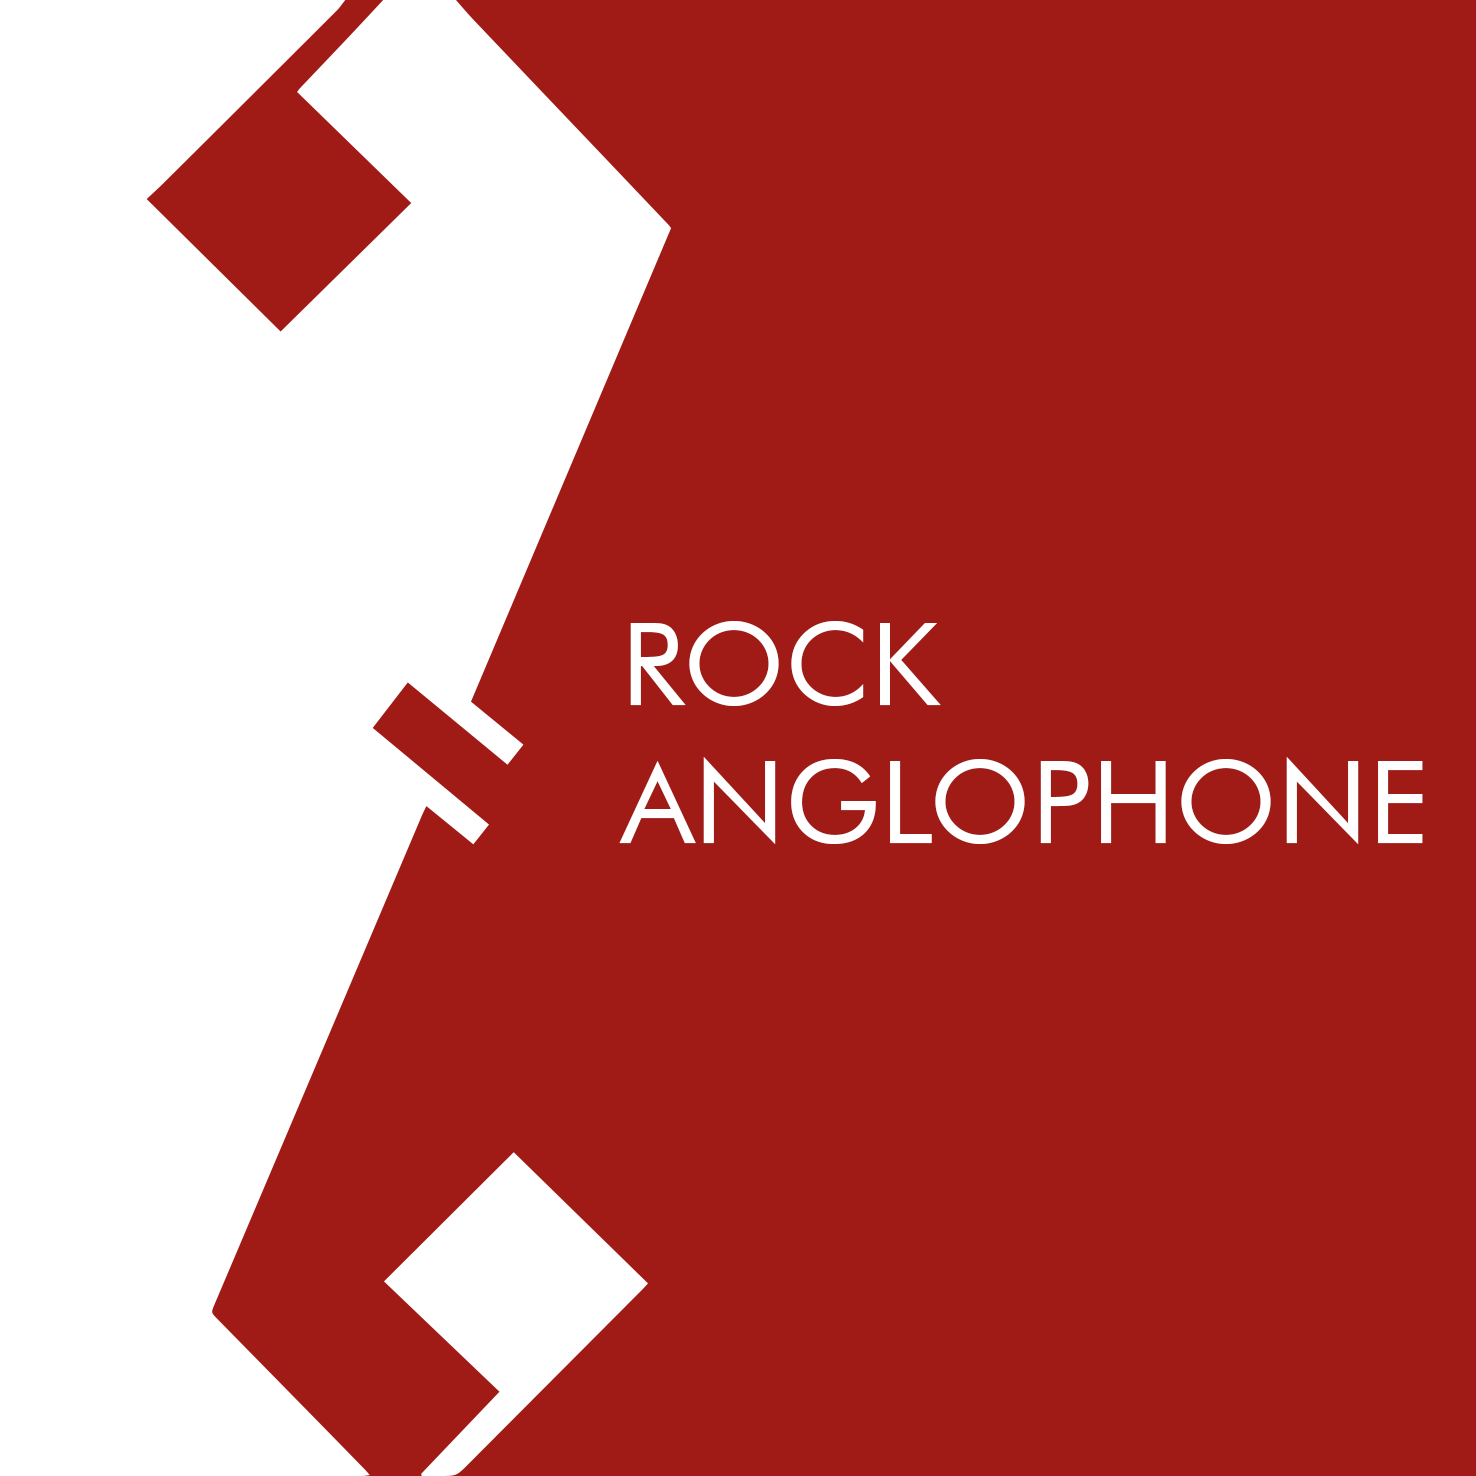 ROCK ANGLOPHONE